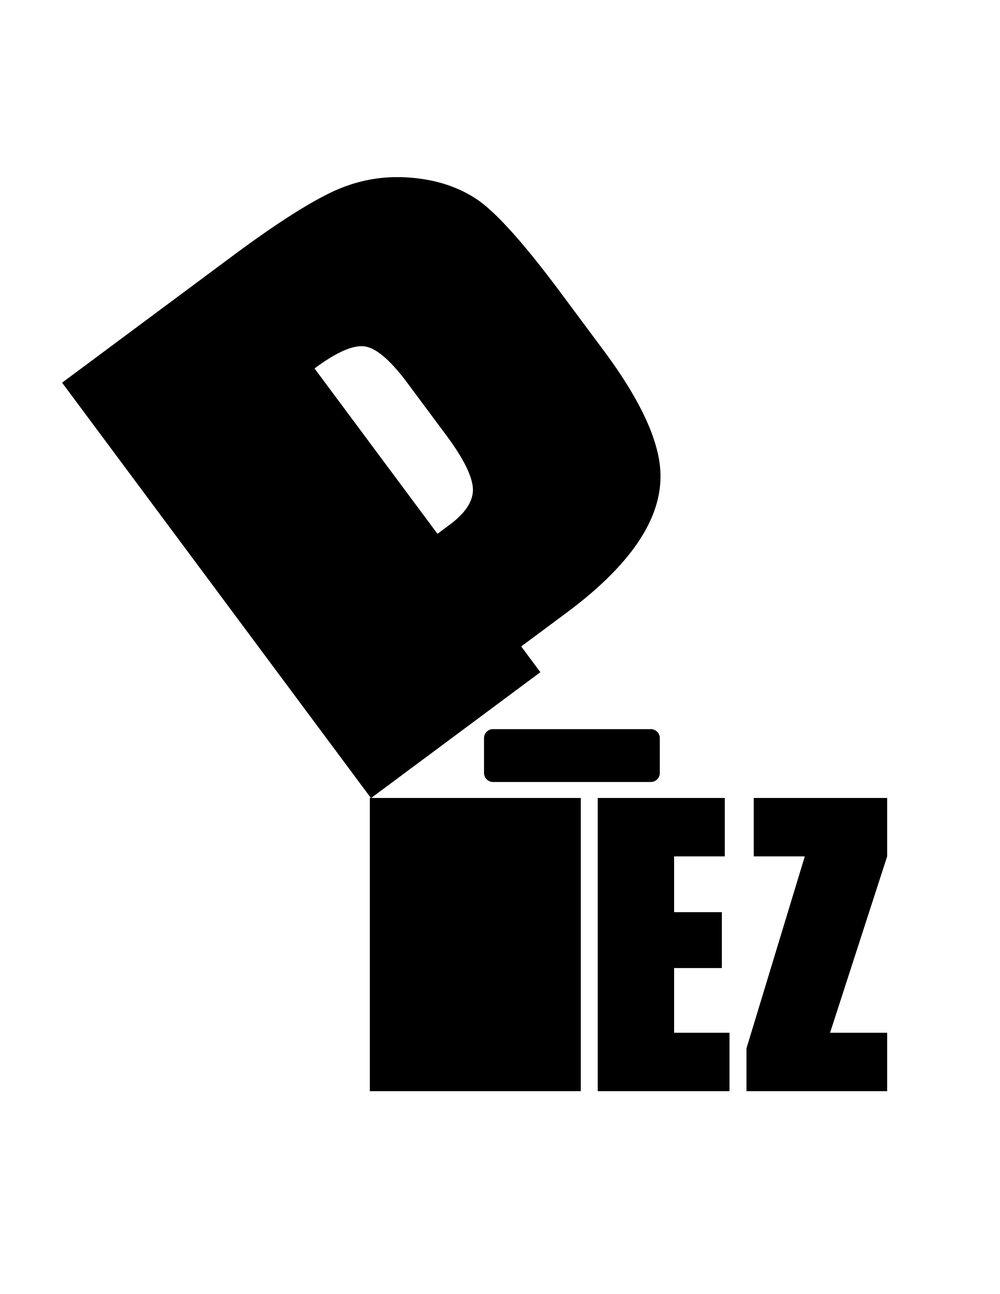 LOGO PEZ-02.jpg